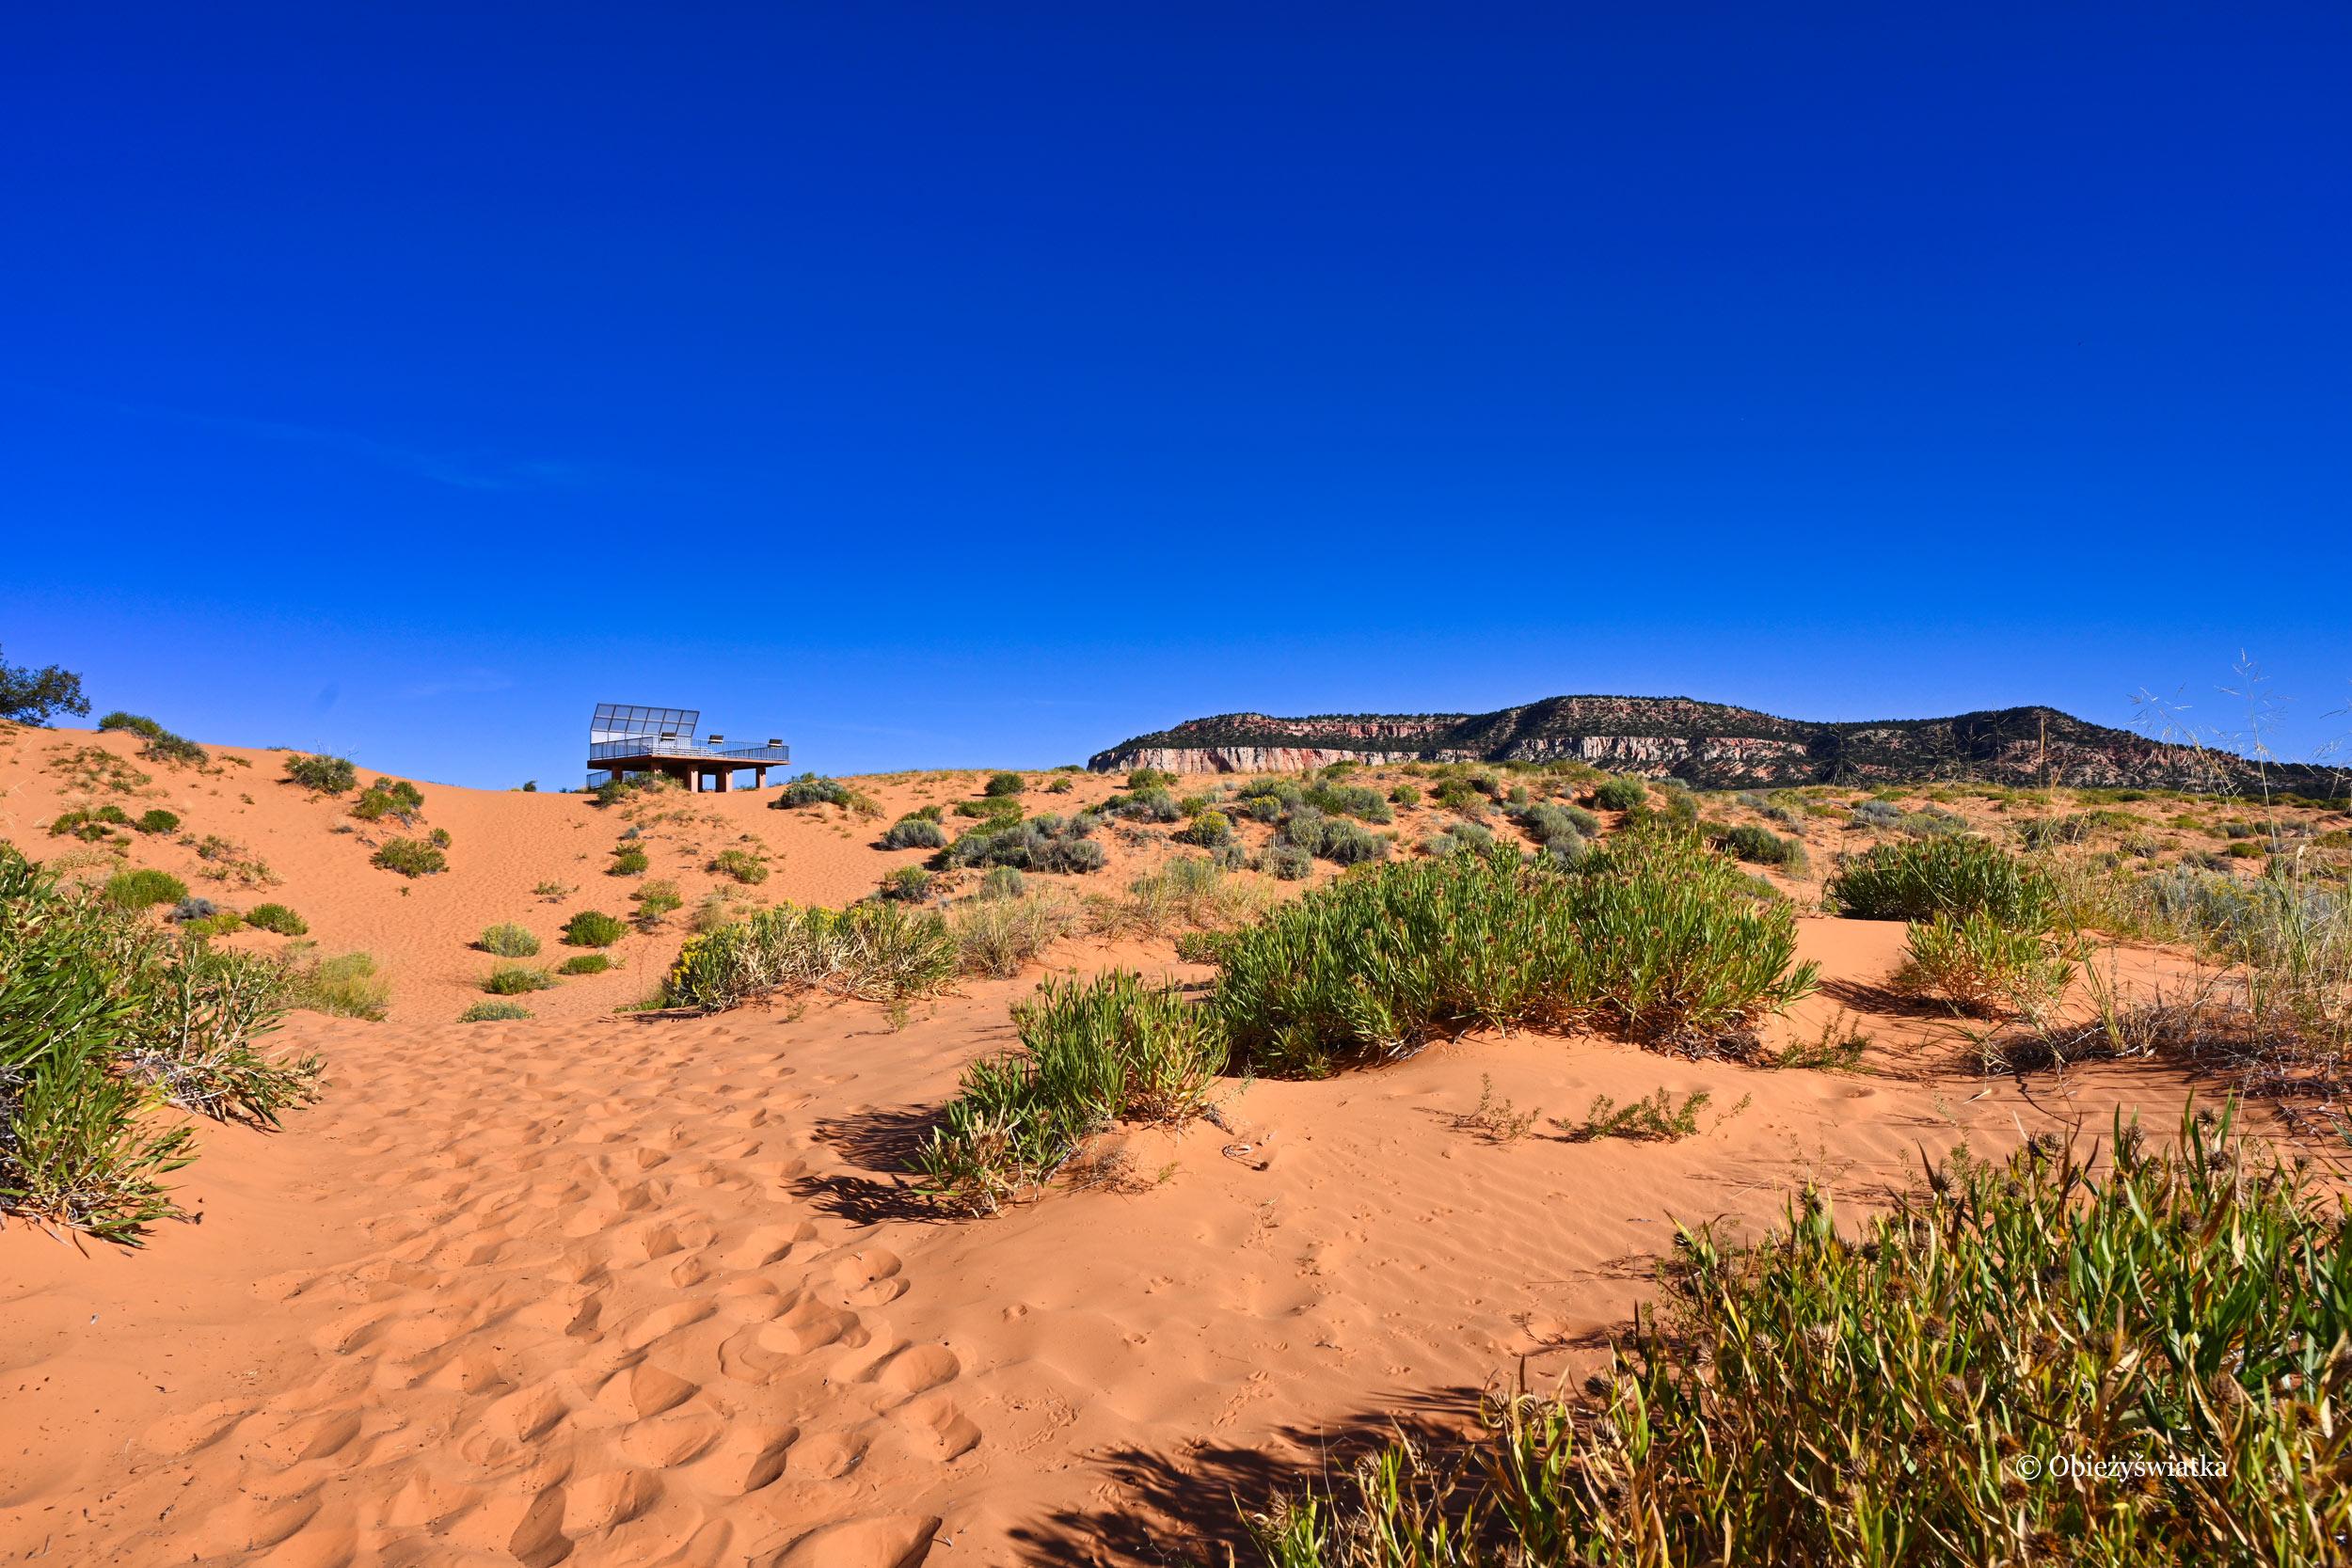 Platforma widokowa, Coral Pink Sand Dunes State Park, Utah